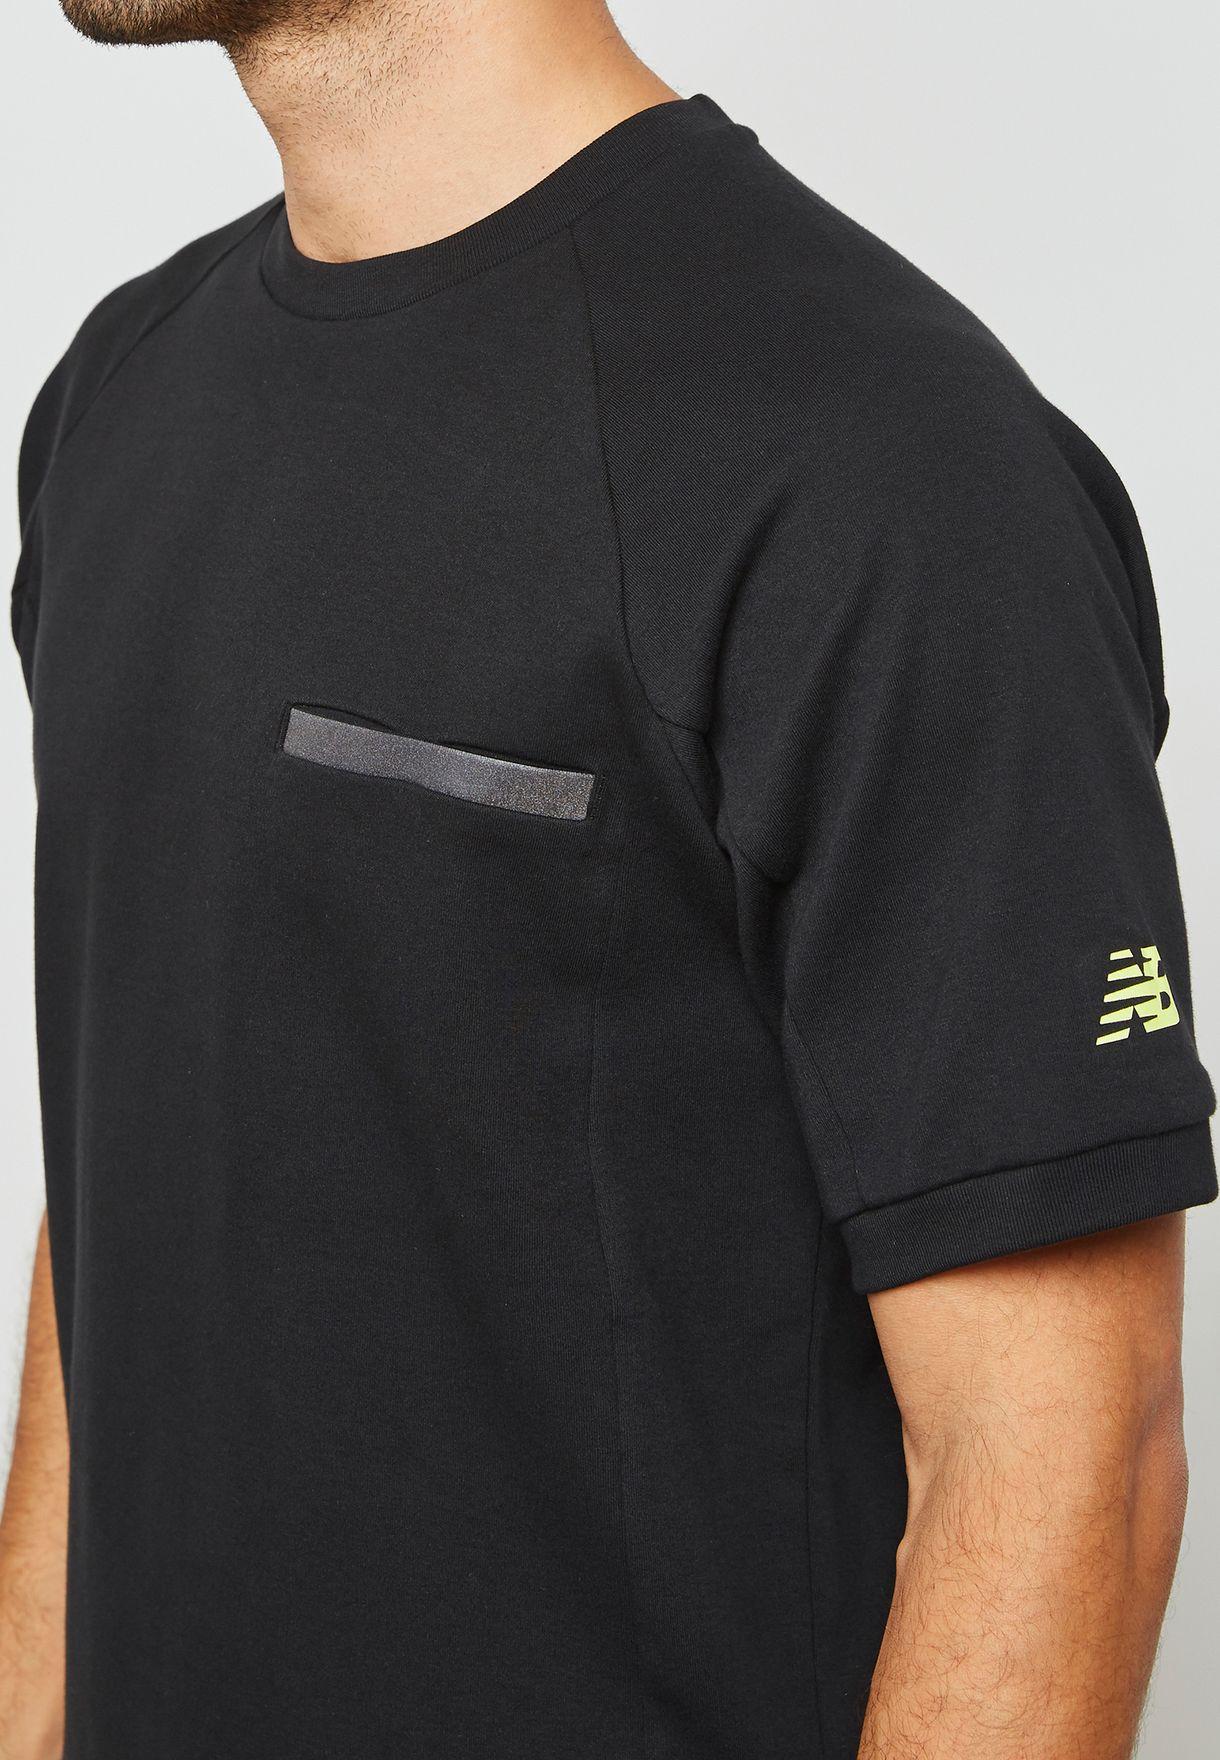 247 Sports Sweatshirt